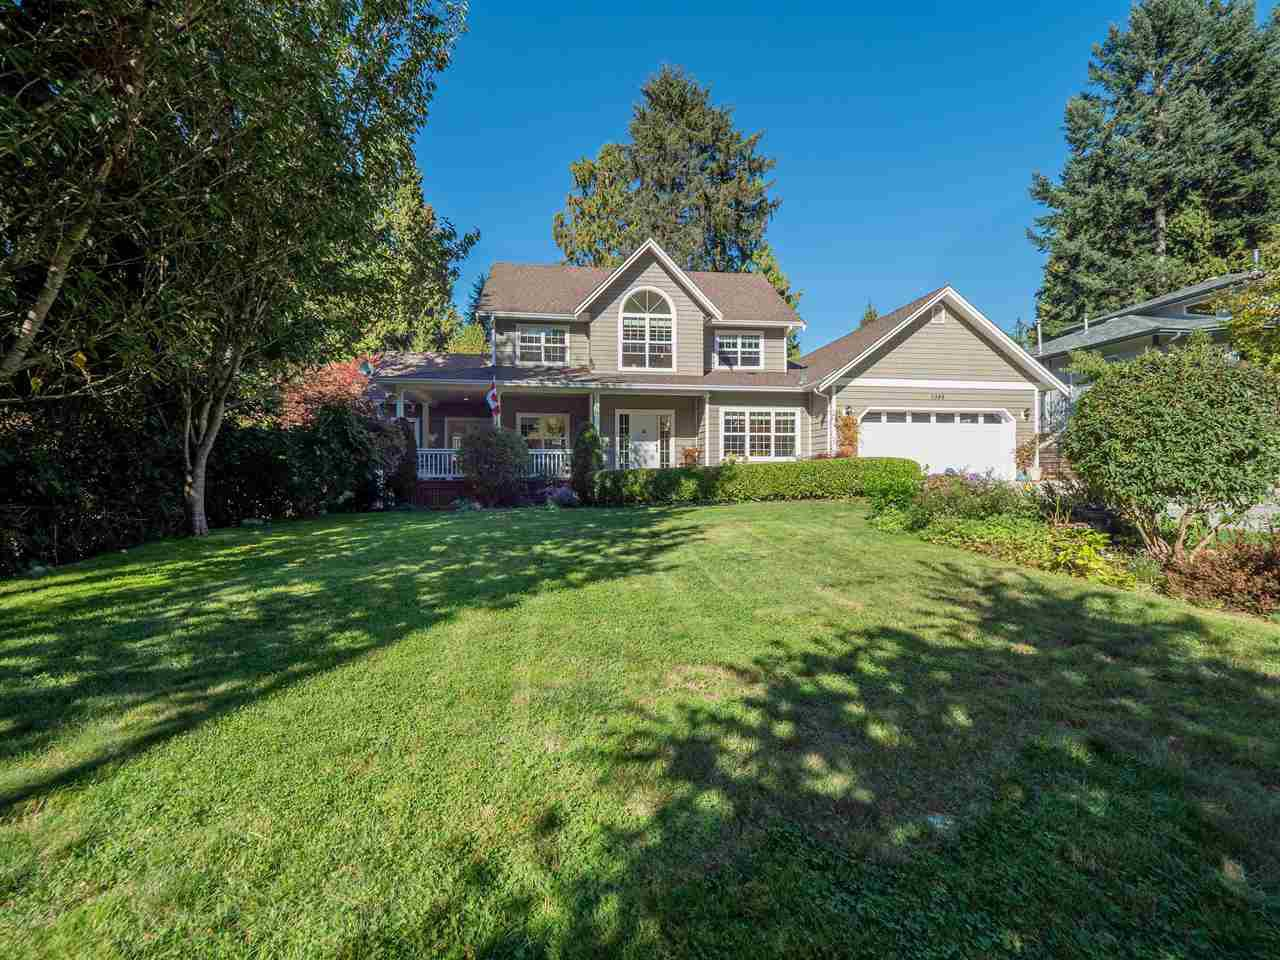 Main Photo: 3388 KRAUS Road: Roberts Creek House for sale (Sunshine Coast)  : MLS®# R2501149